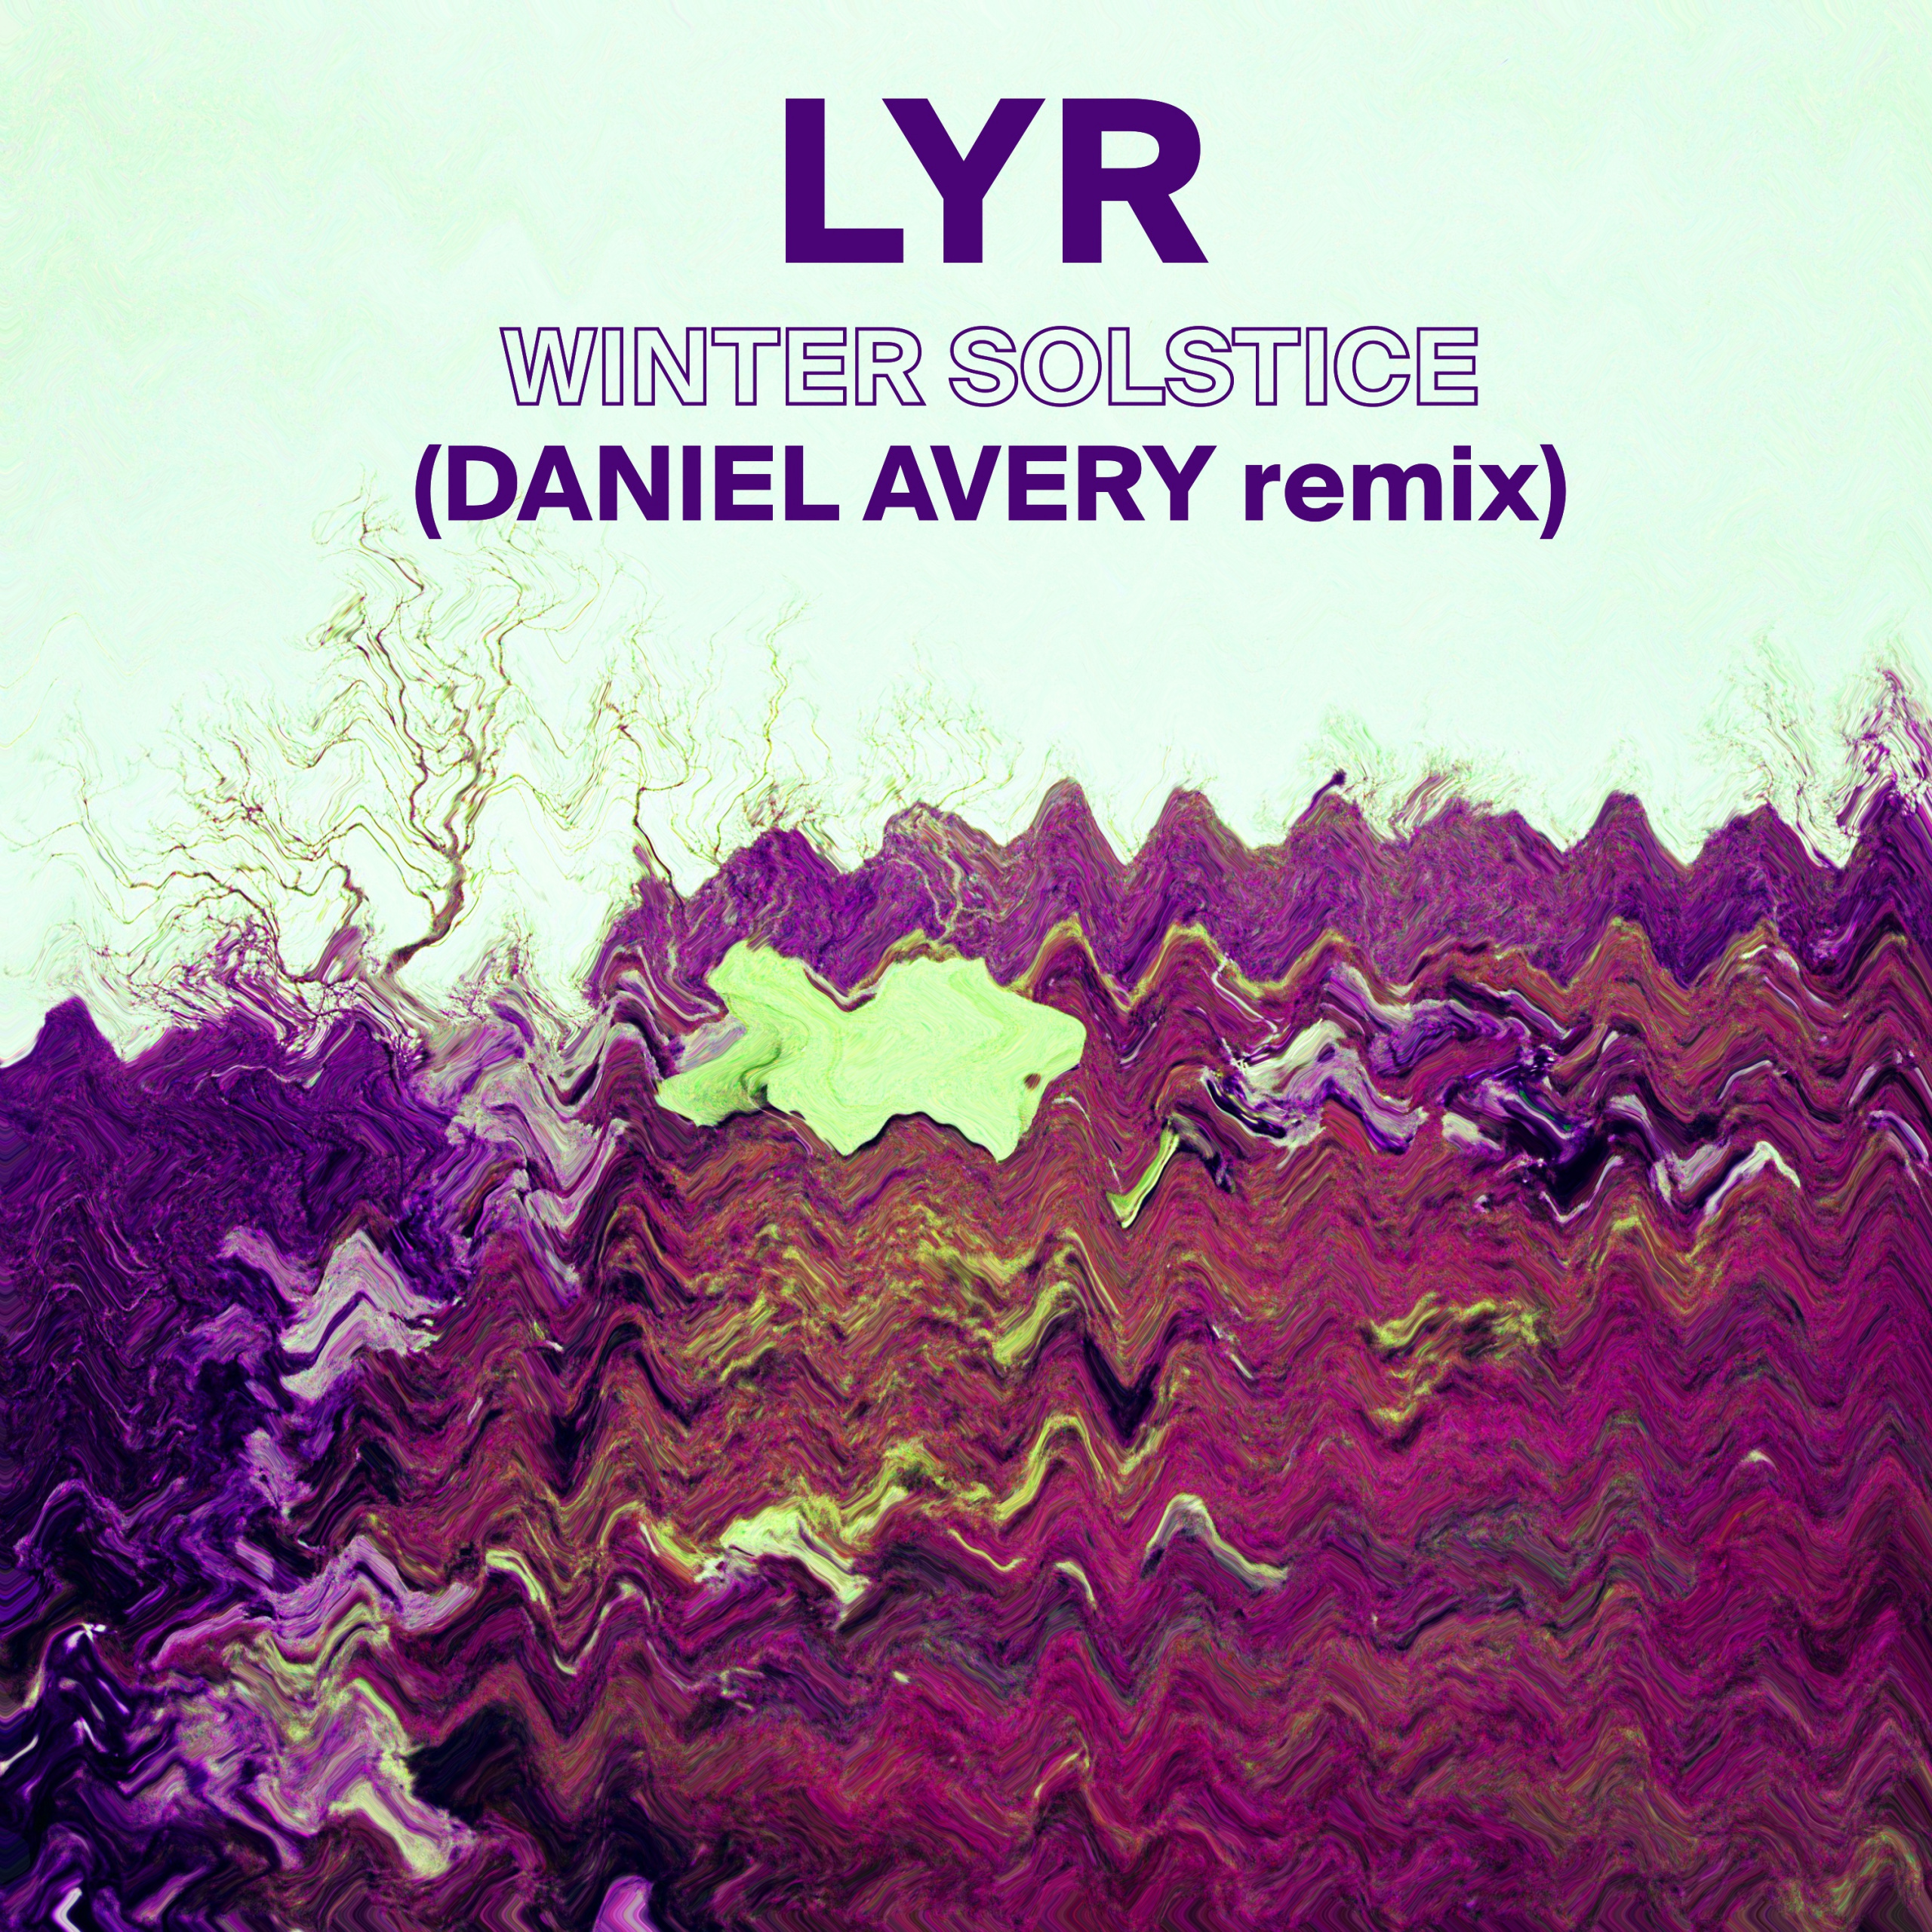 Winter Solstice (Daniel Avery Remix)